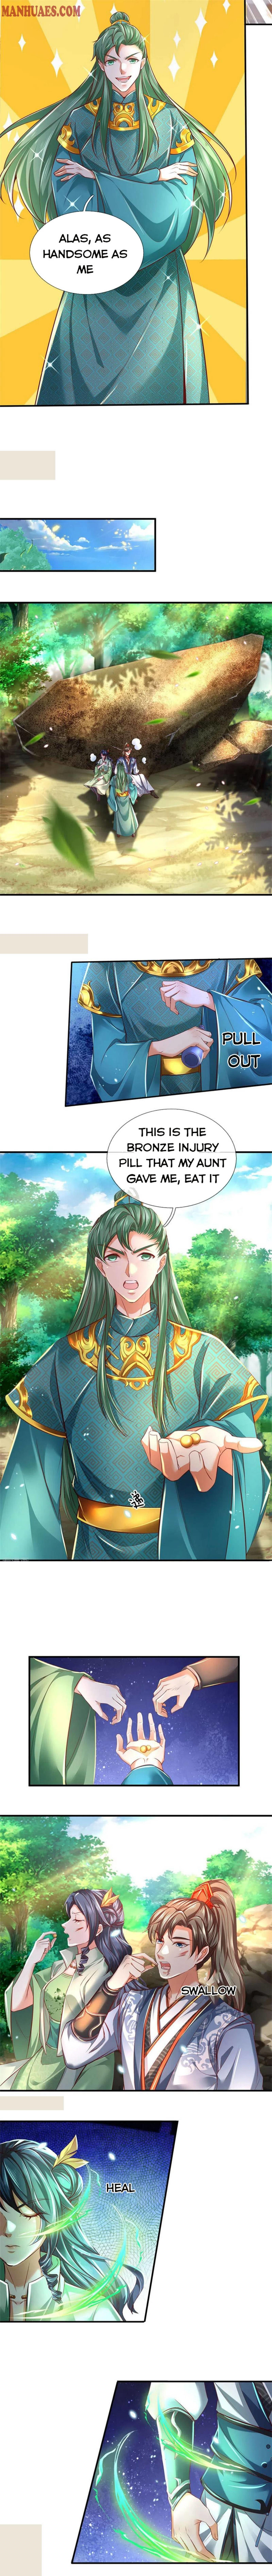 Marvelous Hero Of The Sword Chapter 334 page 3 - Mangakakalots.com